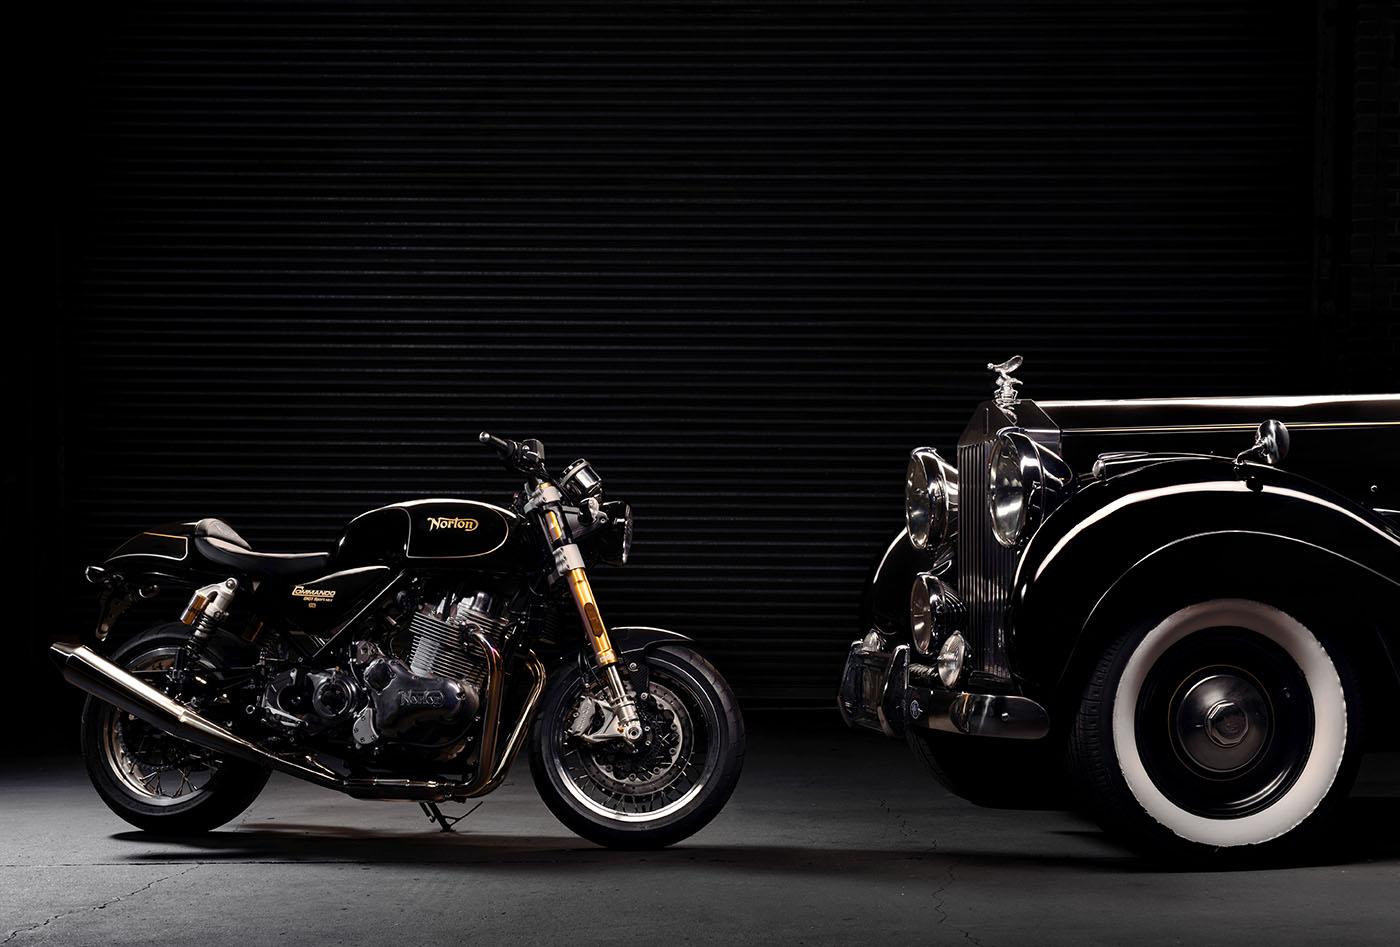 Norton Commando 961 and Rolls Royce Silver Wraith